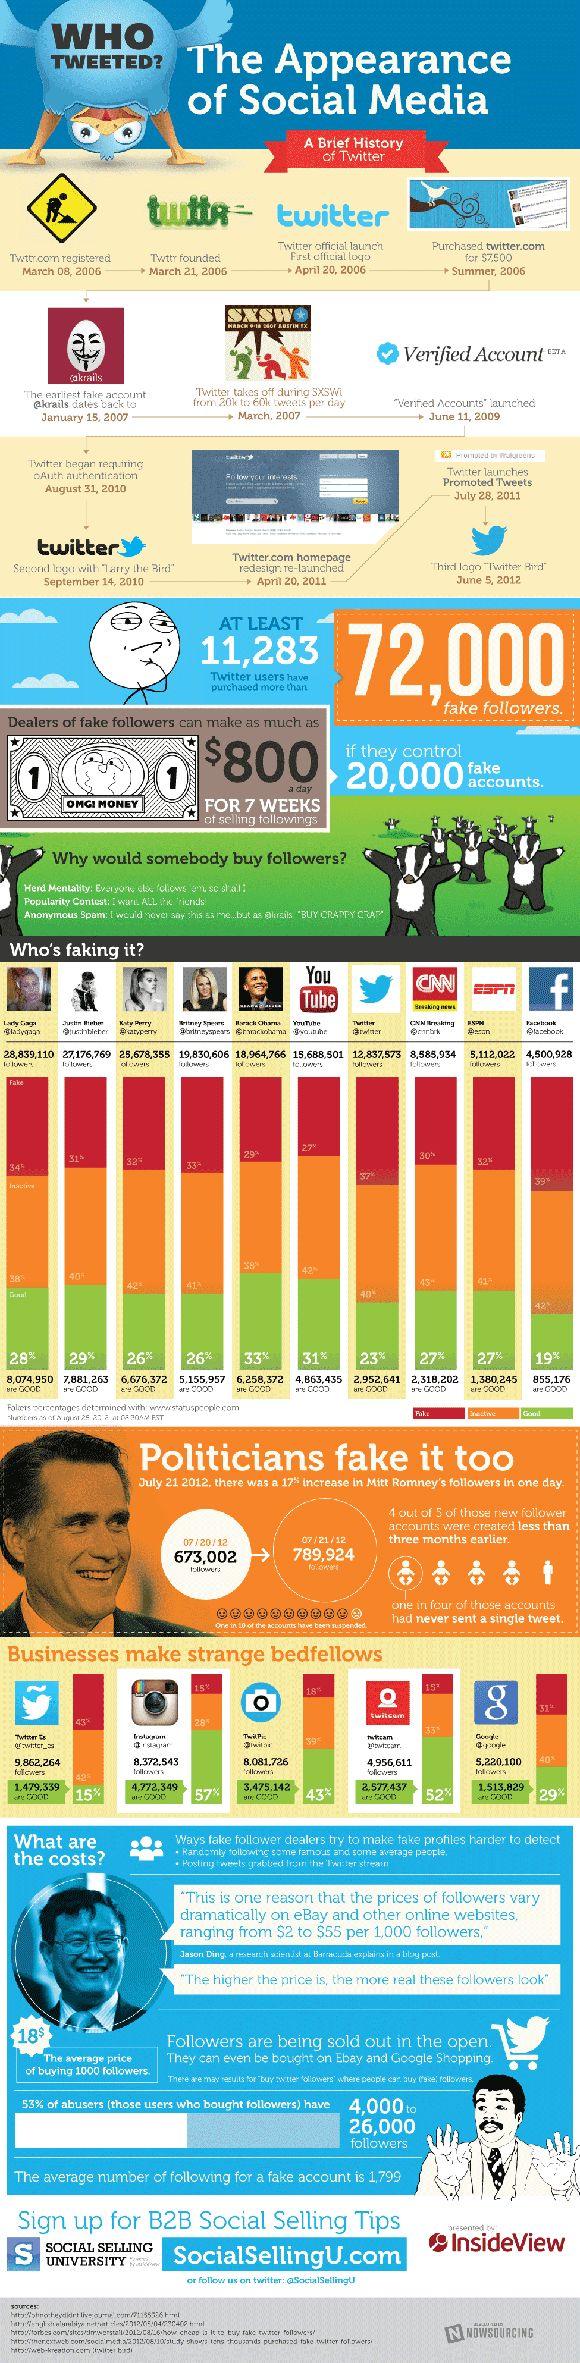 #Twitter fake followers infographic